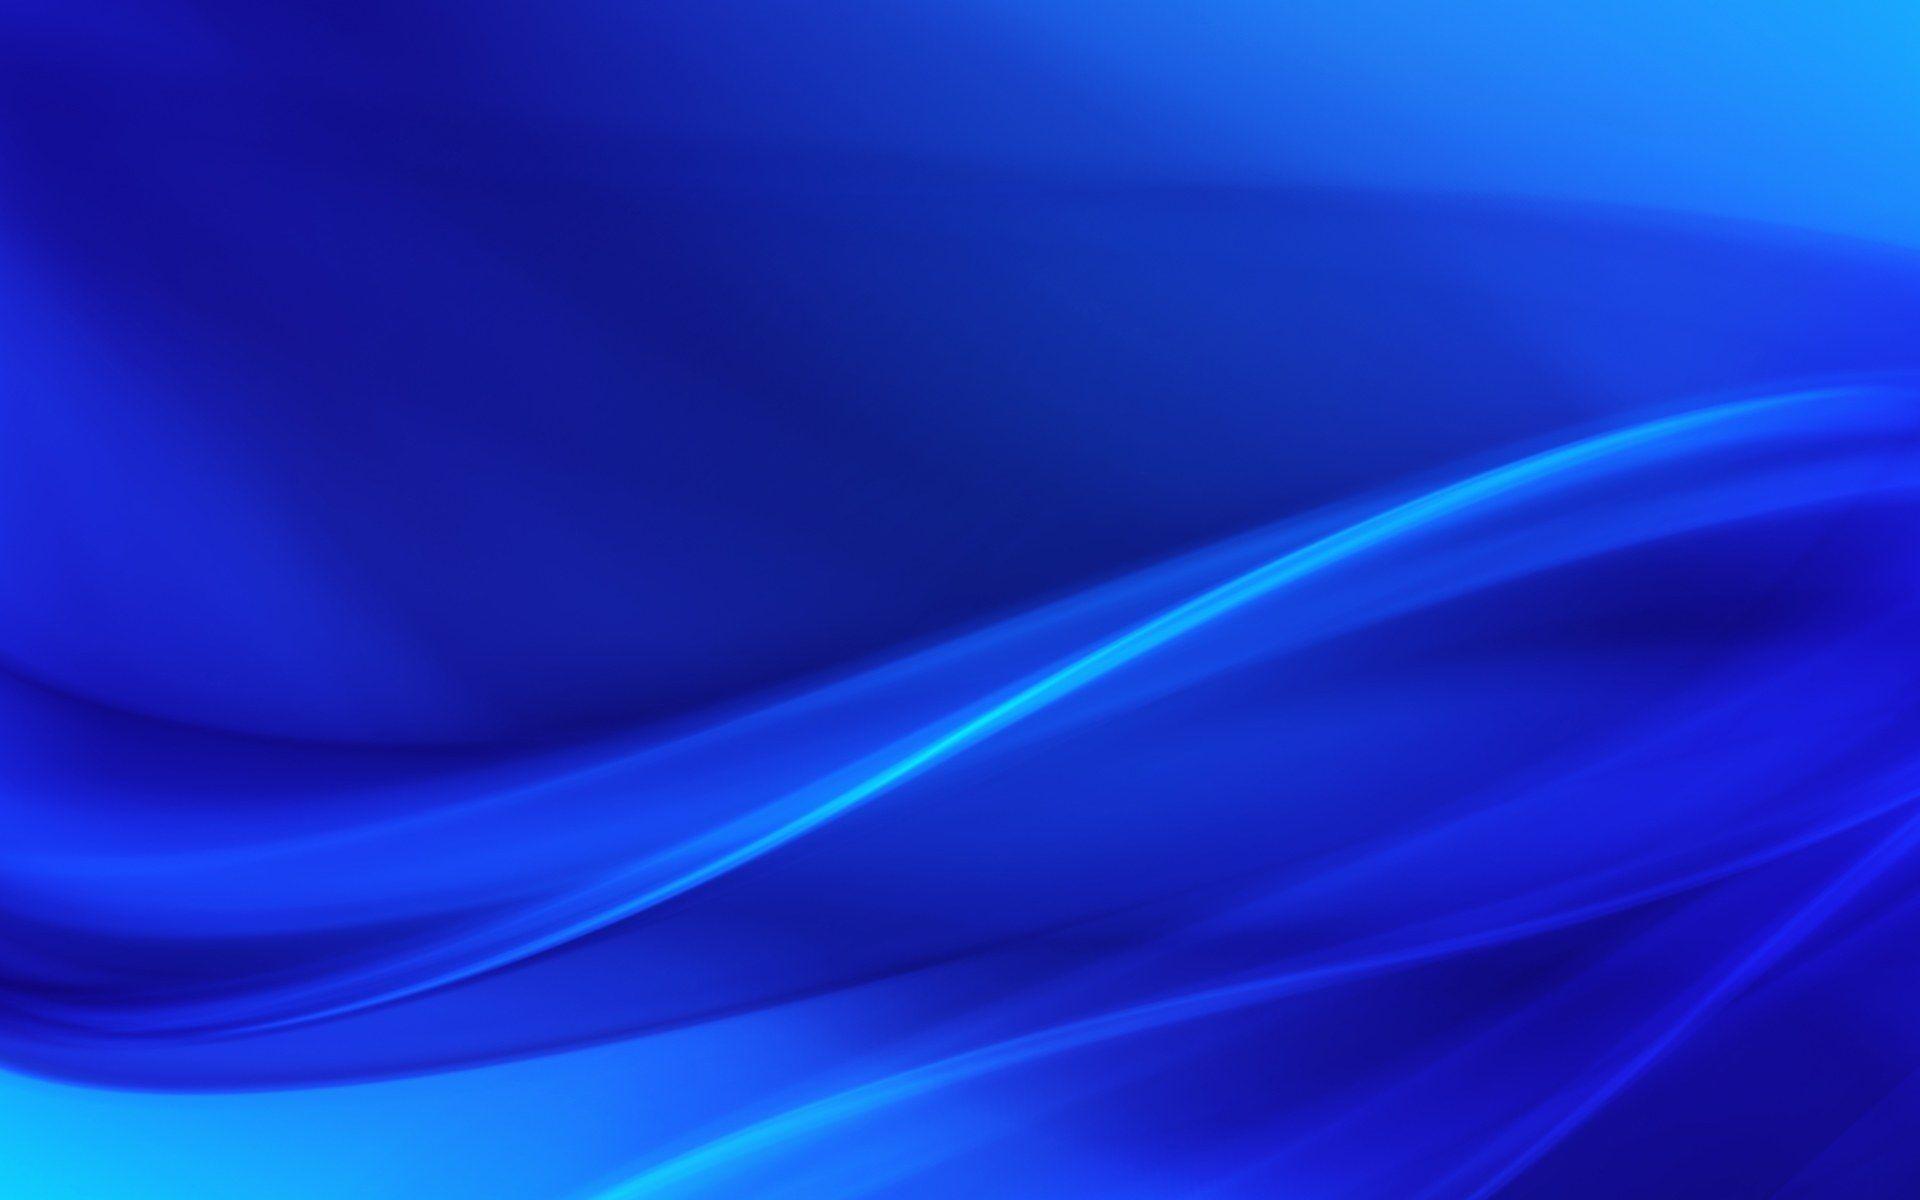 Light Blue Wallpaper Backgrounds Free Download.